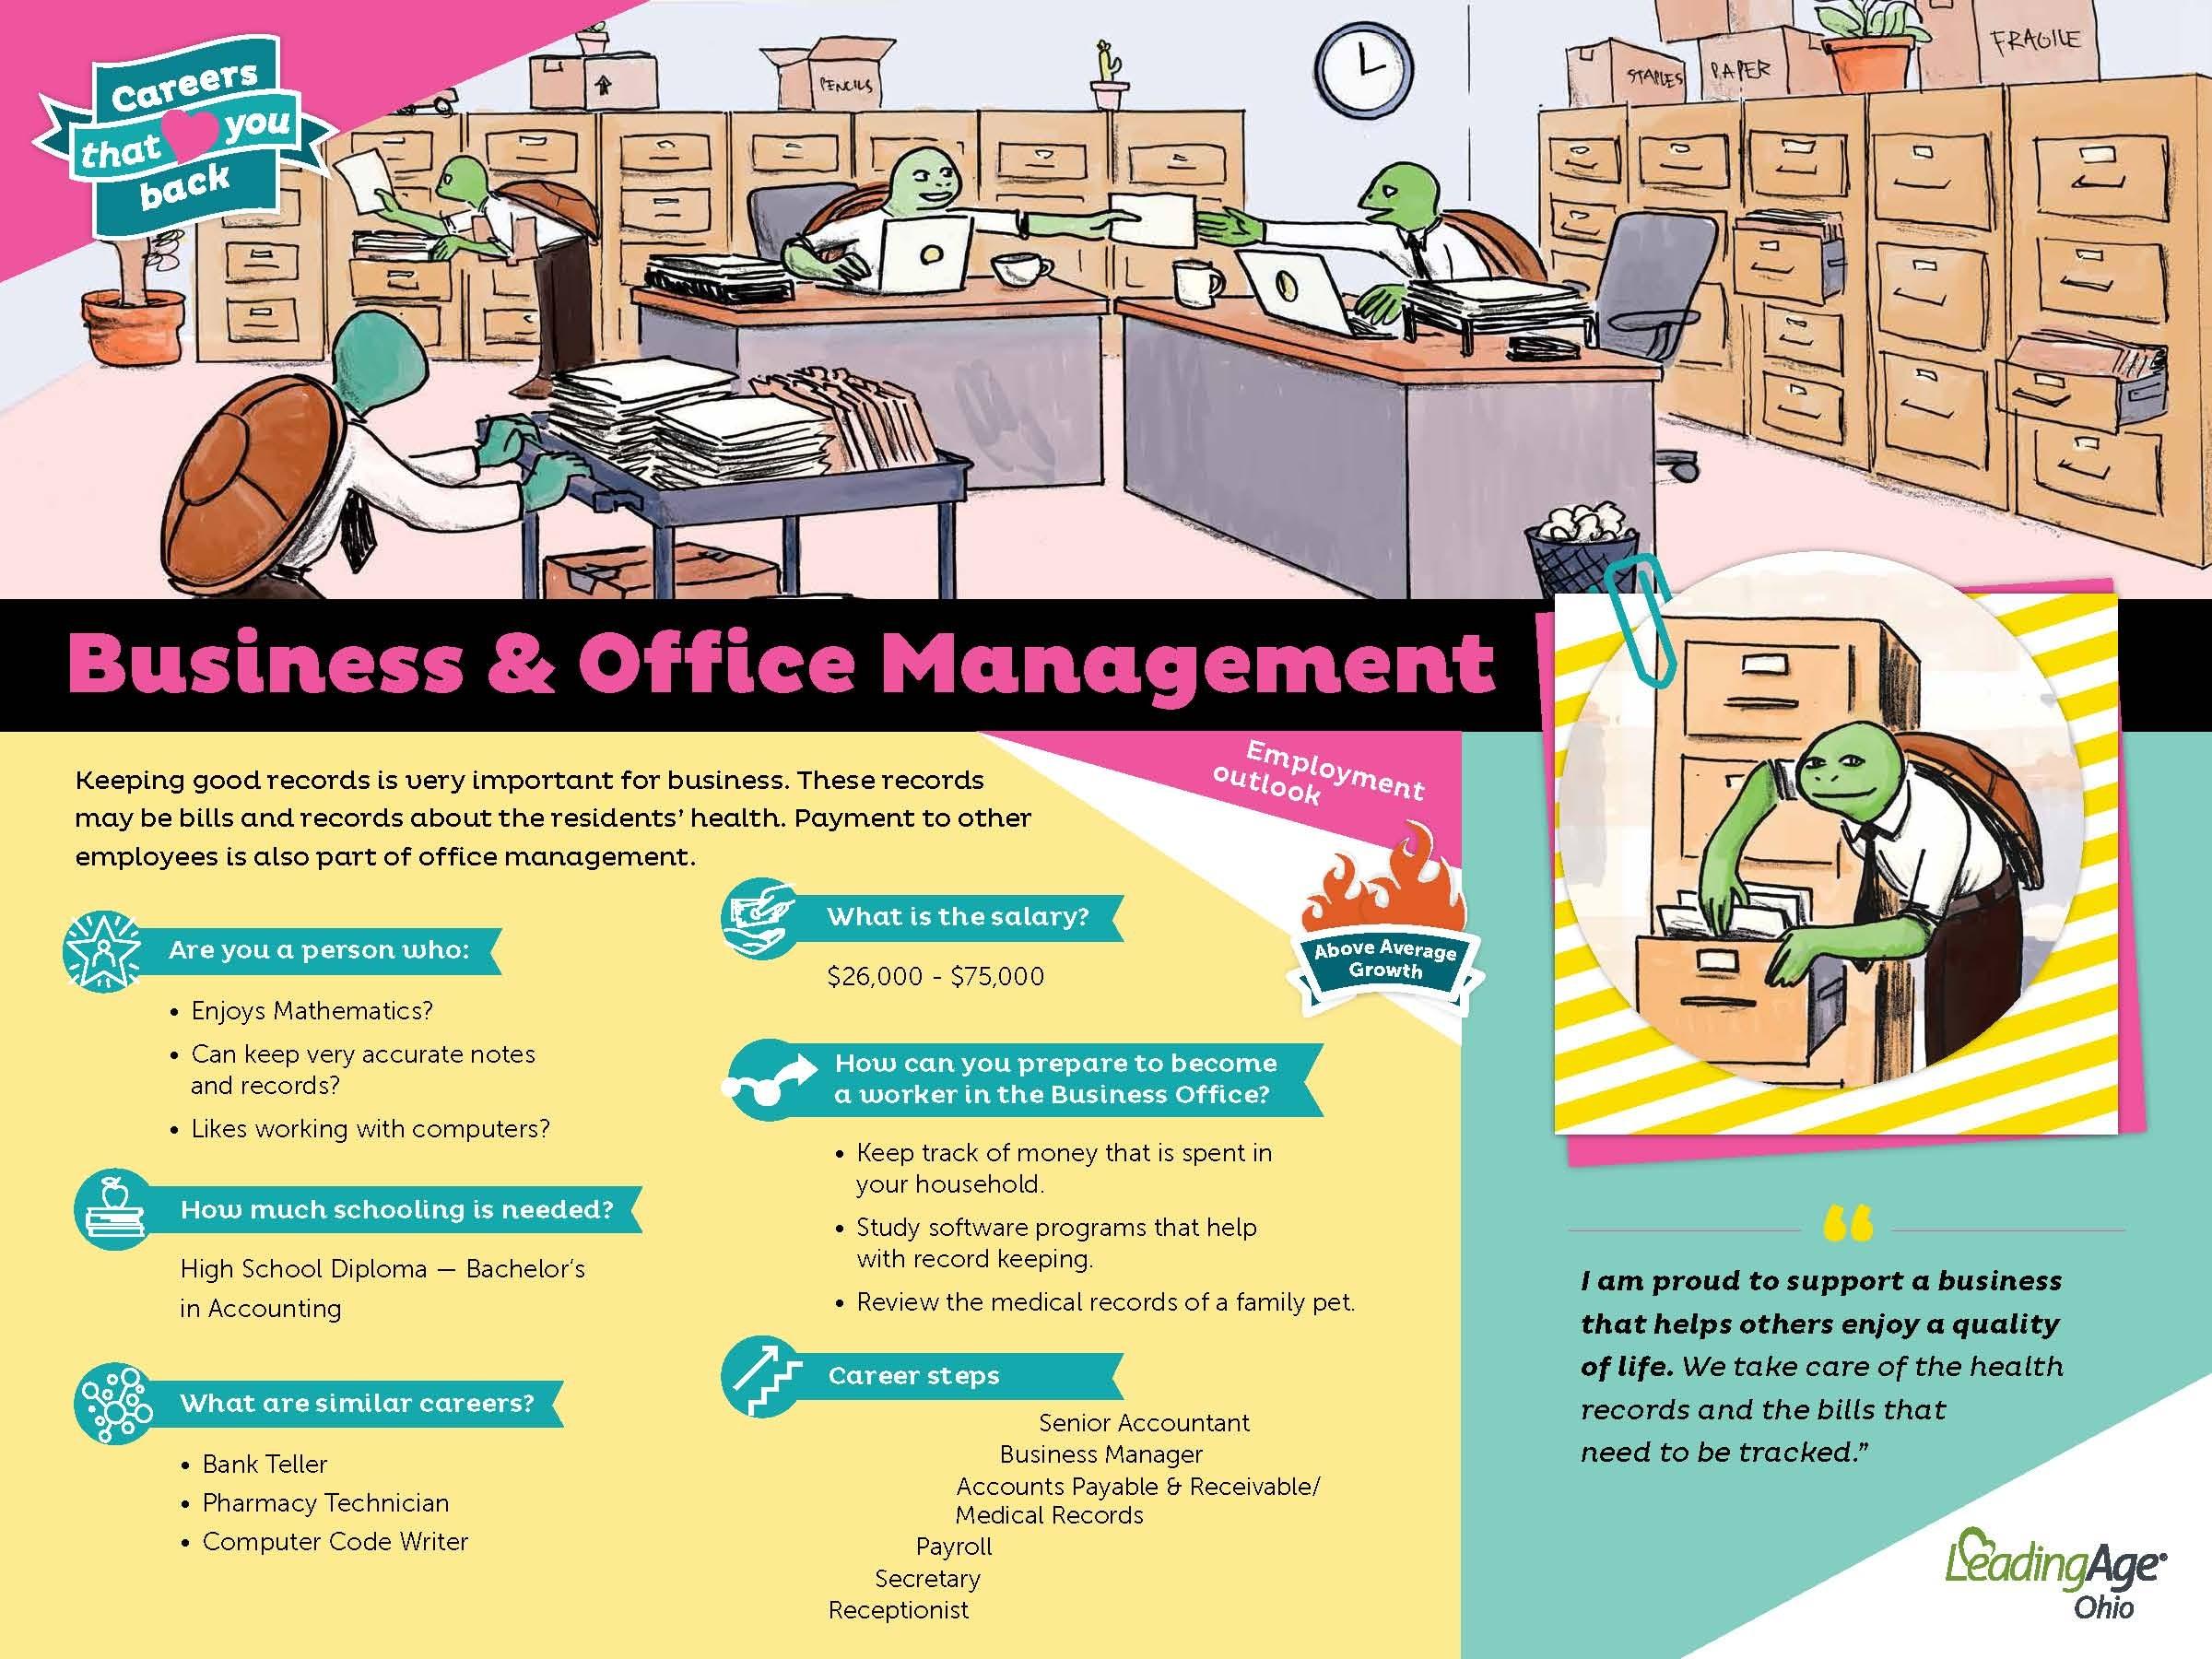 Business & Office Management